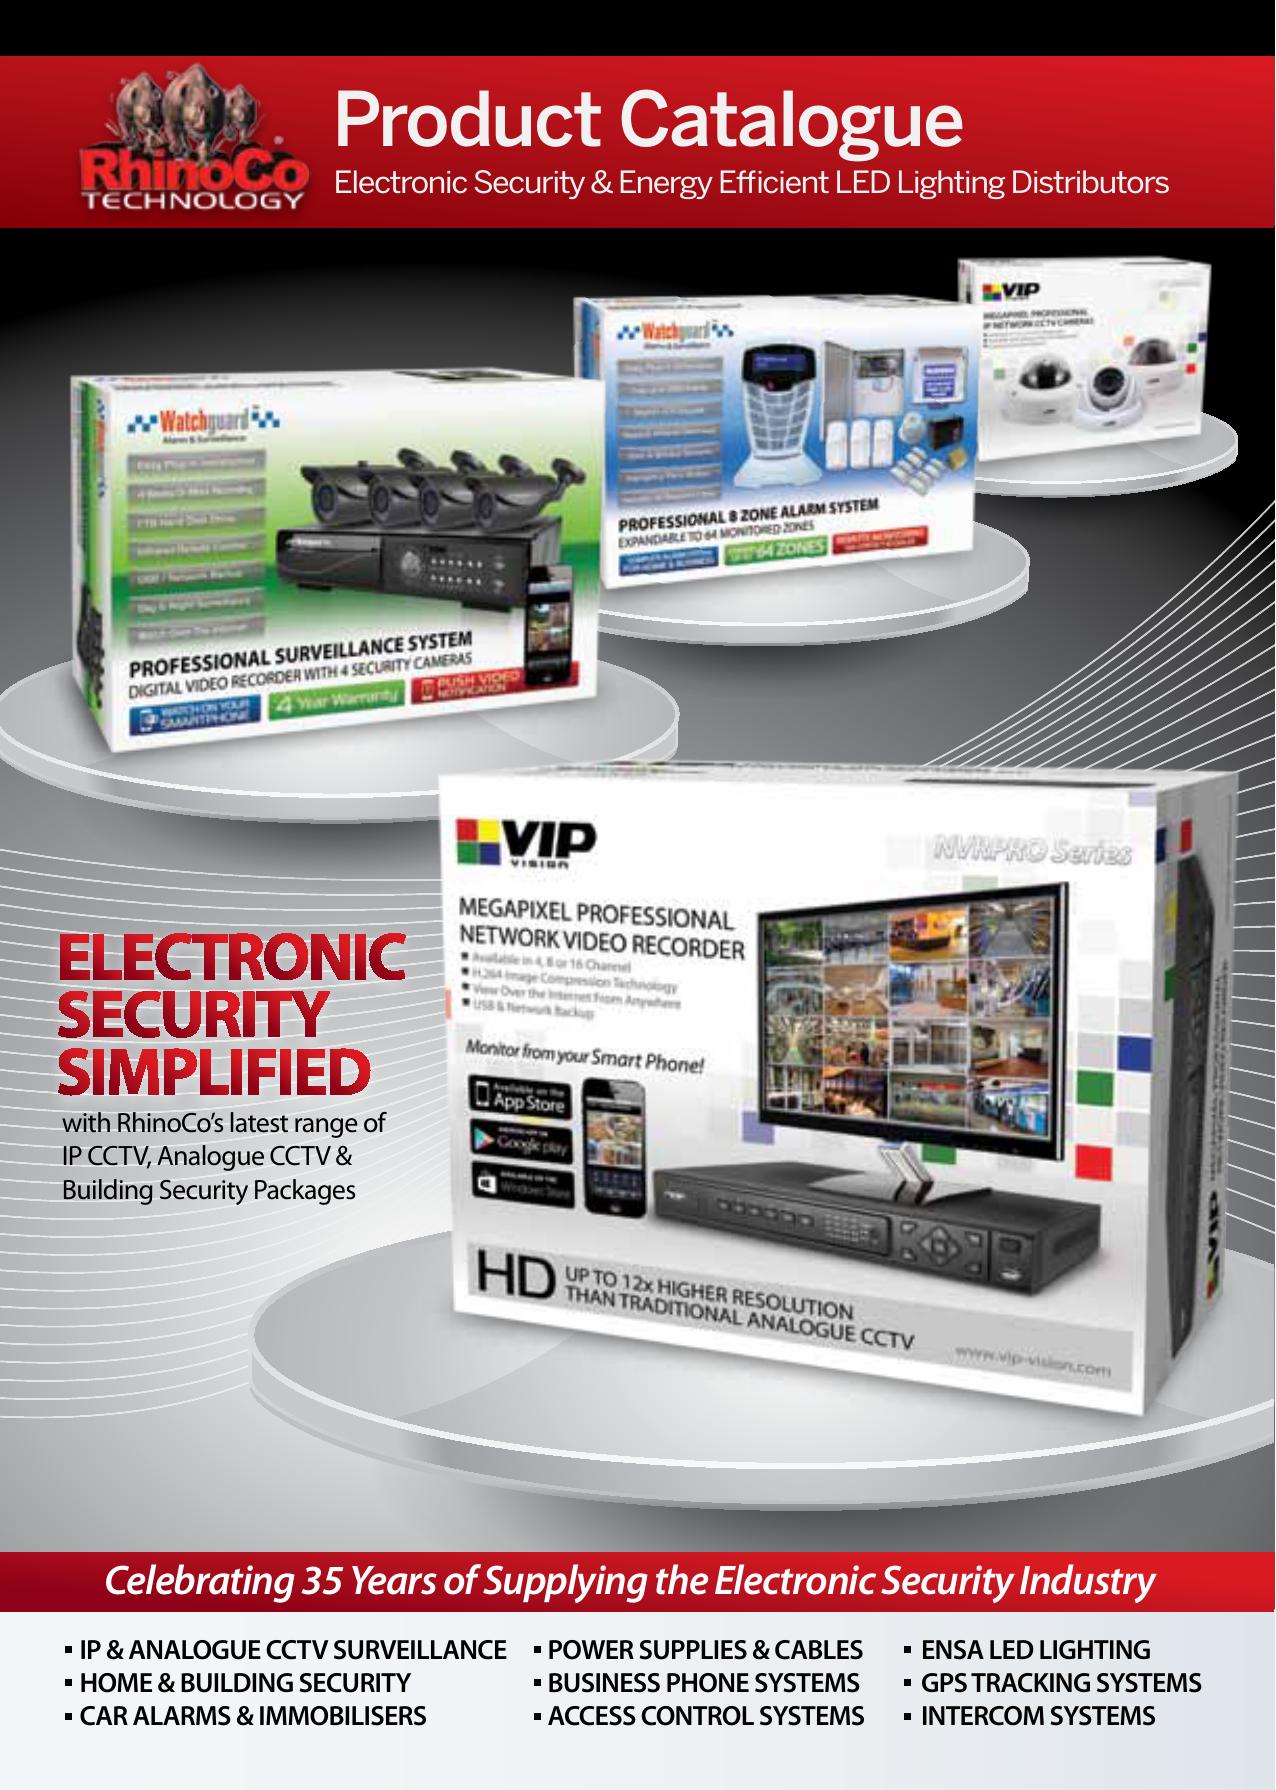 Product Catalogue - Description | manualzz com